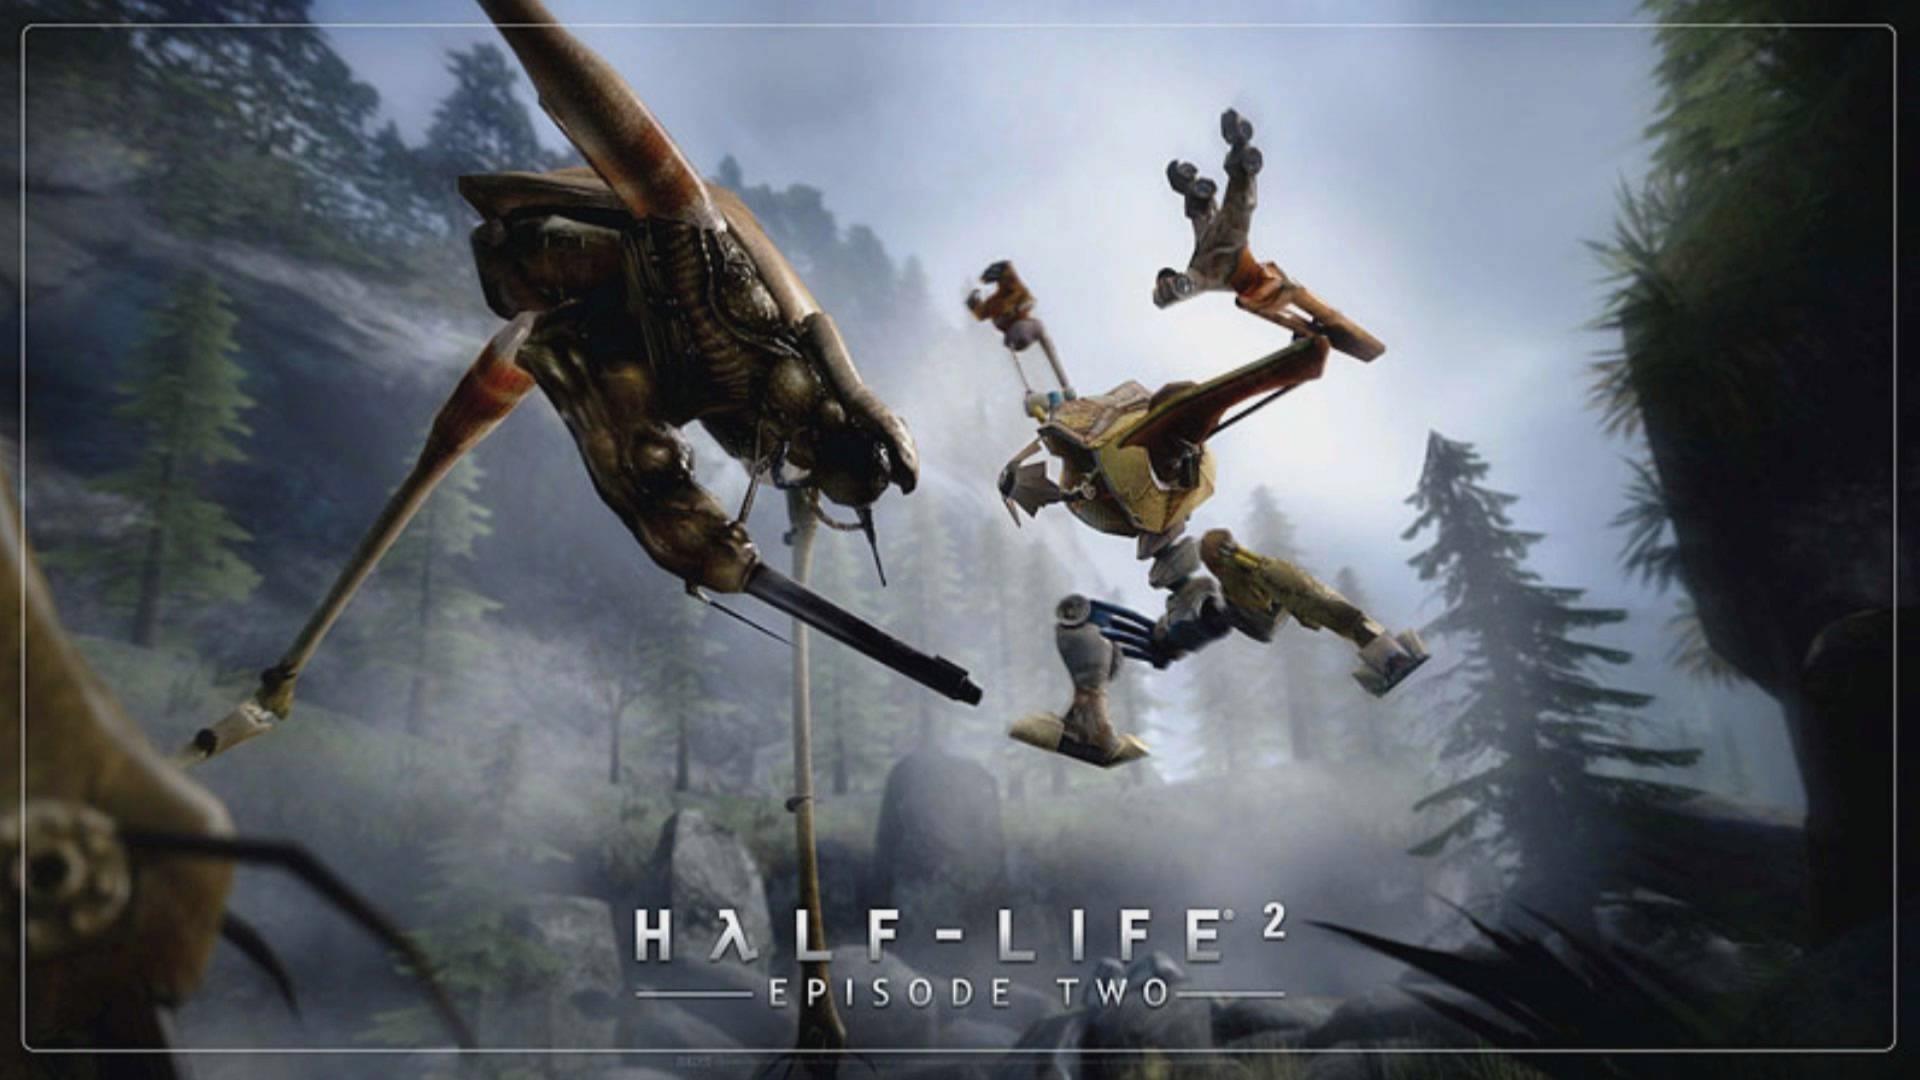 Half Life 2 wallpaper Download beautiful full HD 1920x1080